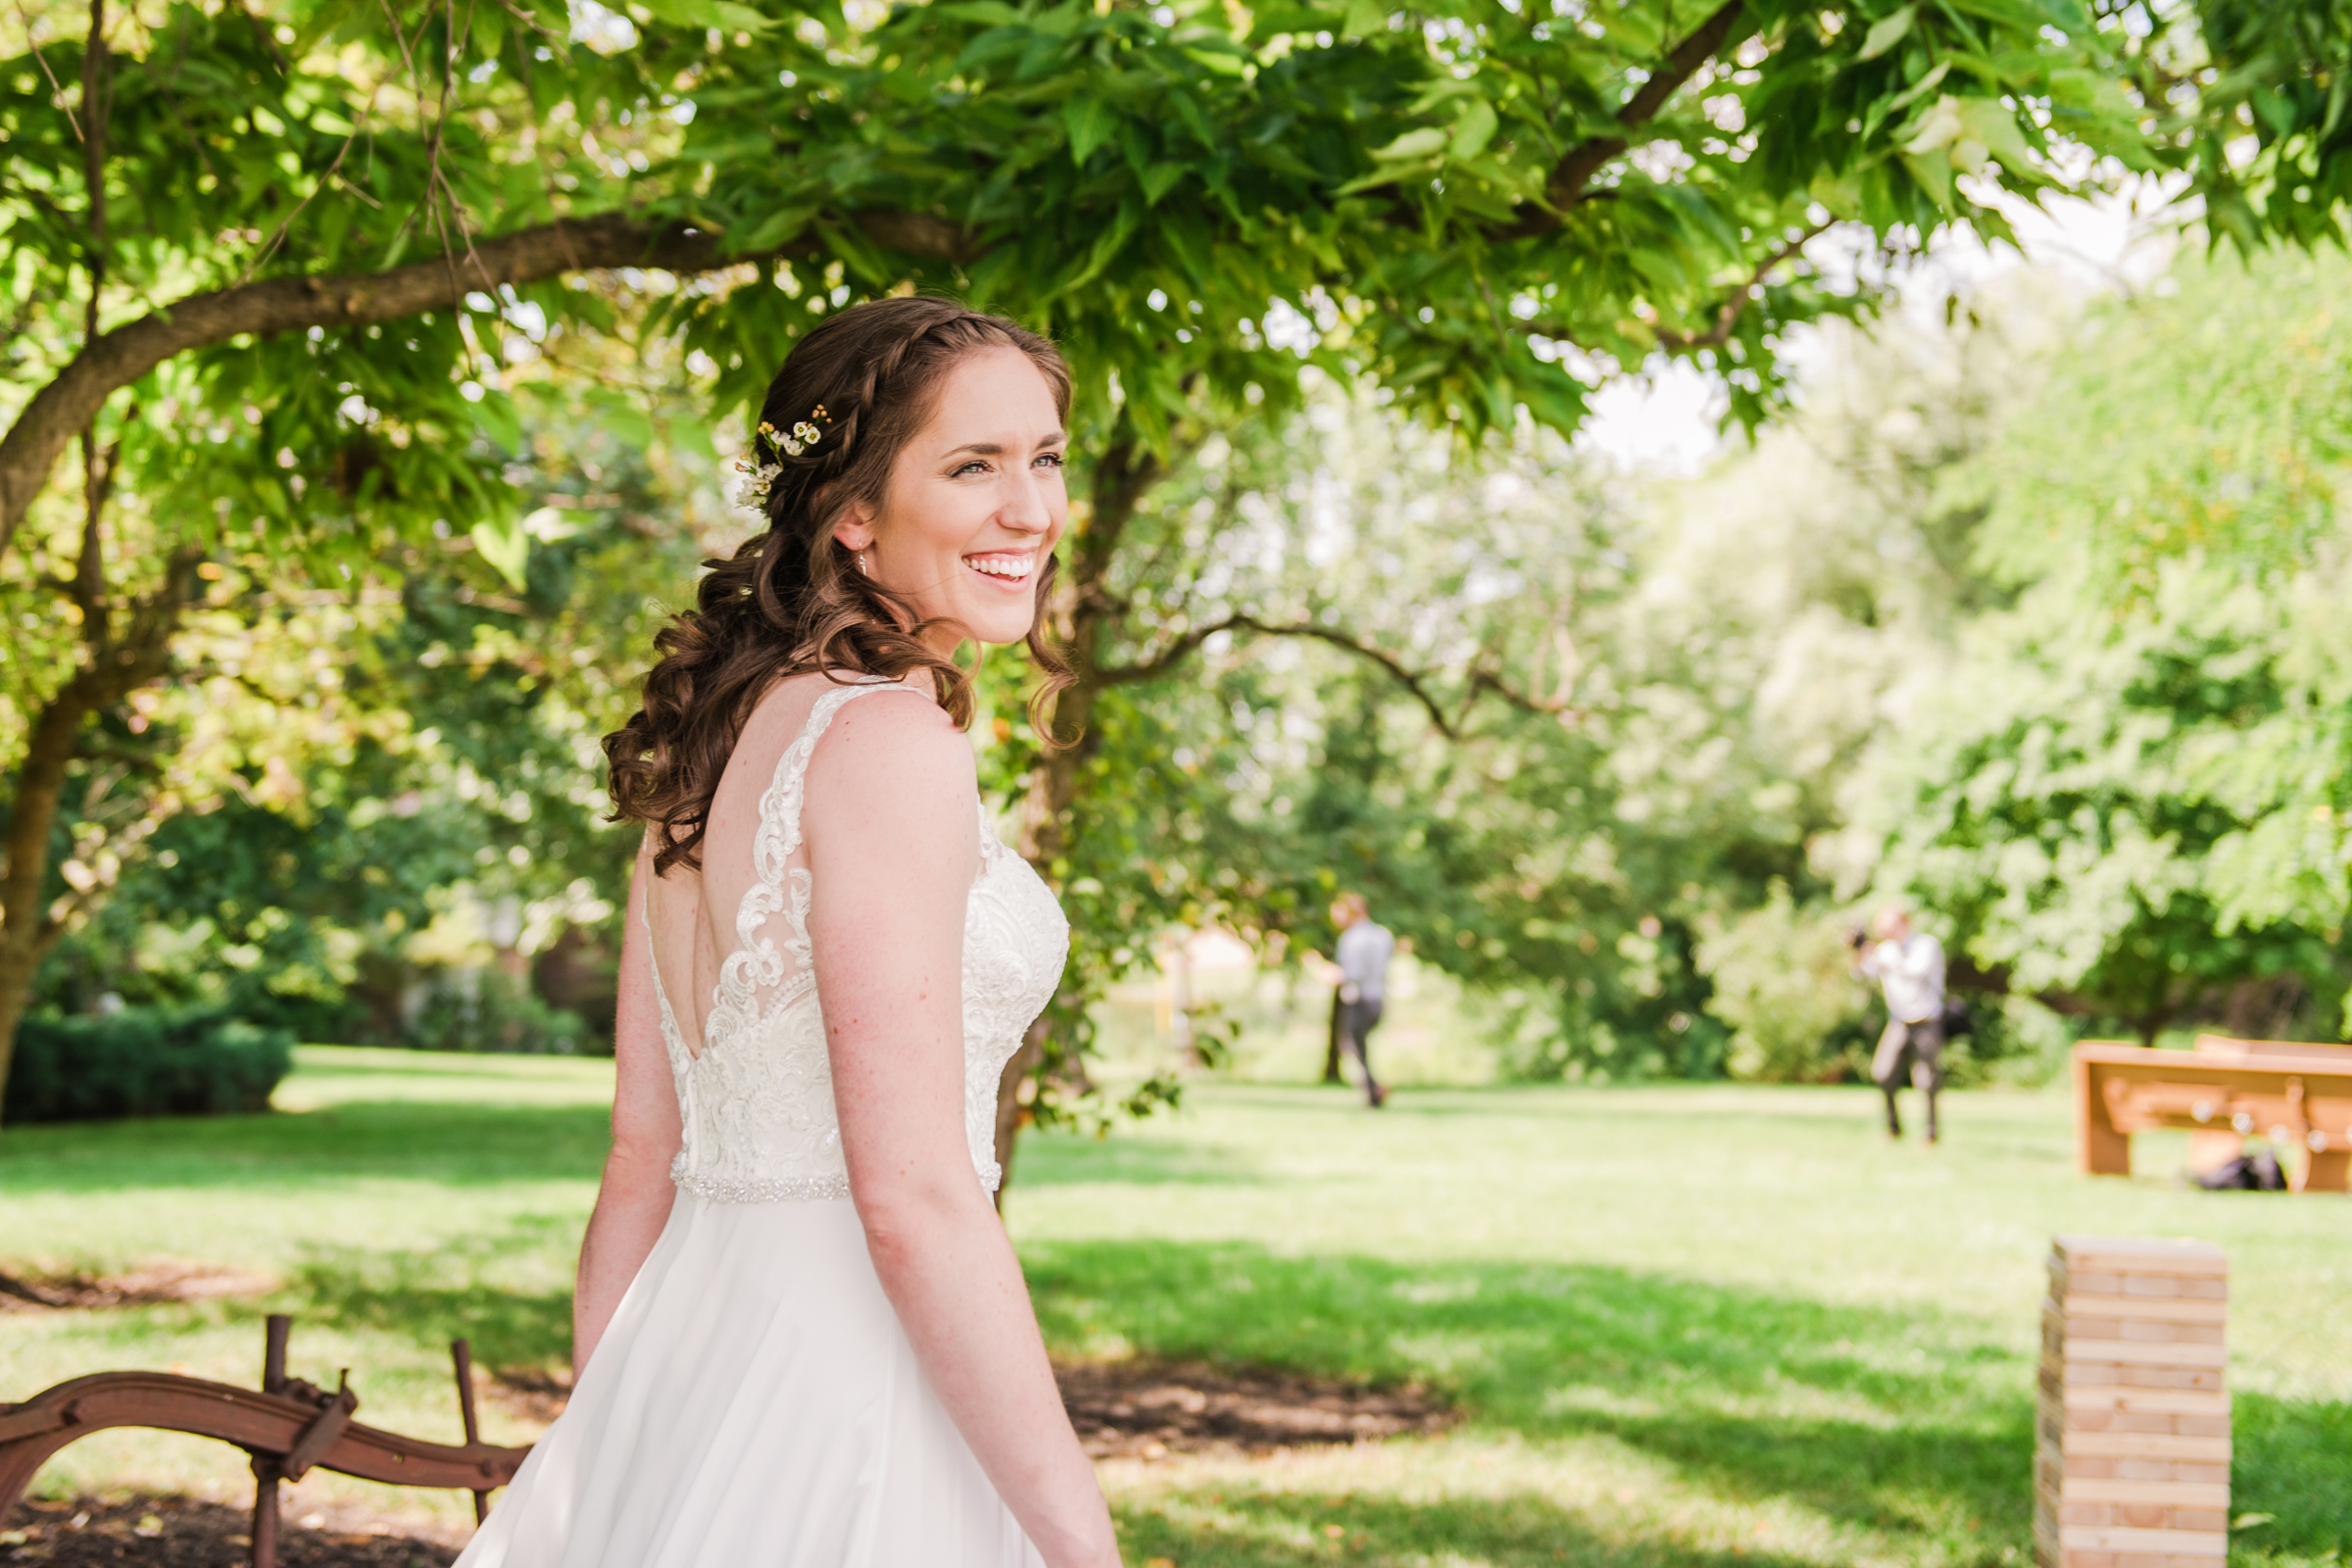 Jerris_Wadsworth_Wedding_Barn_Rochester_Wedding_JILL_STUDIO_Rochester_NY_Photographer_DSC_2255.jpg